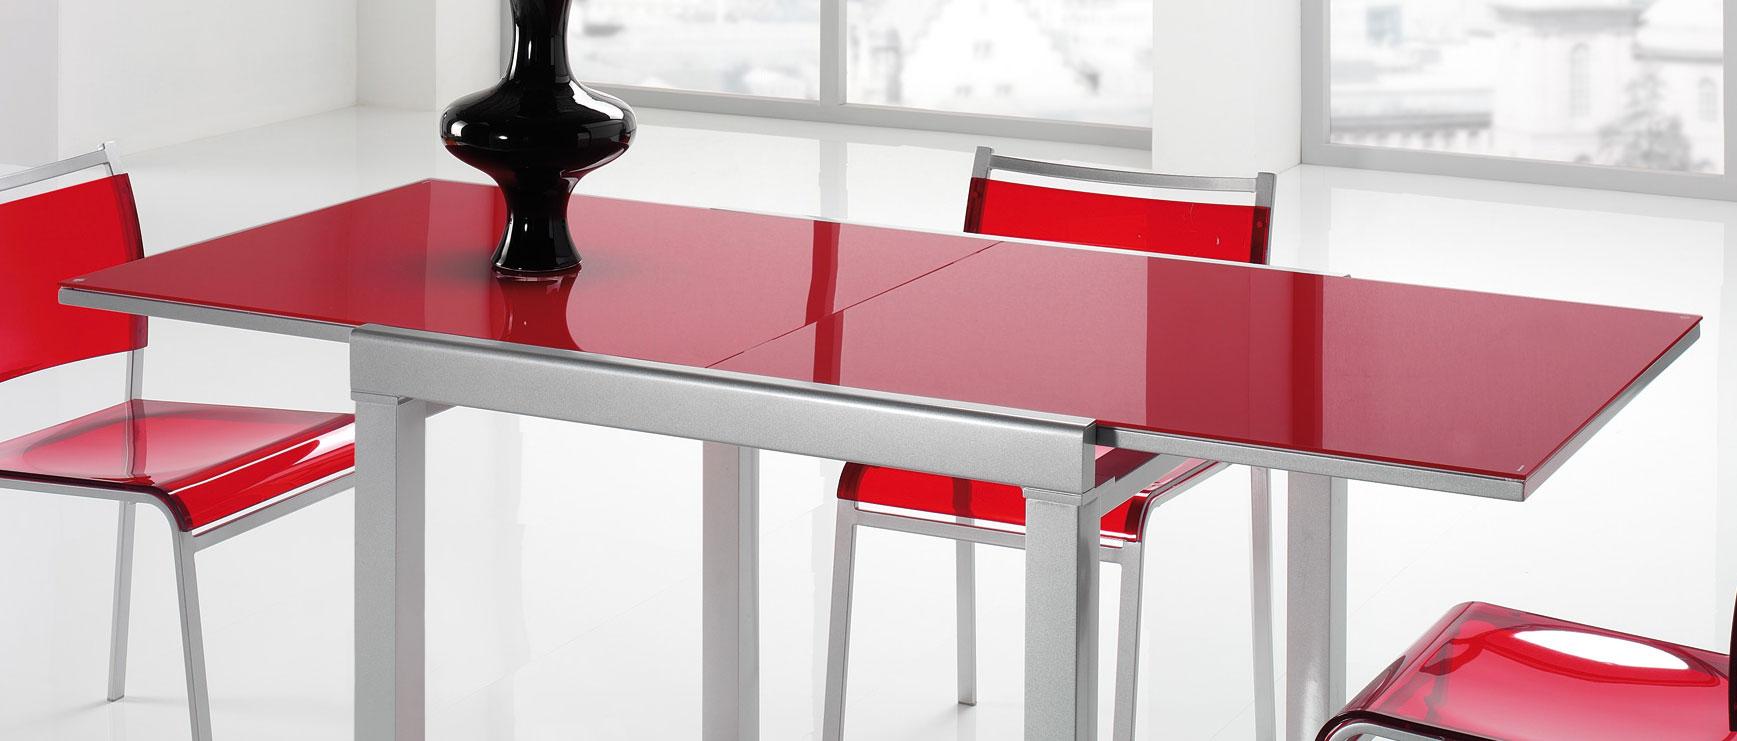 Target point table vega 90 table for Target tavoli